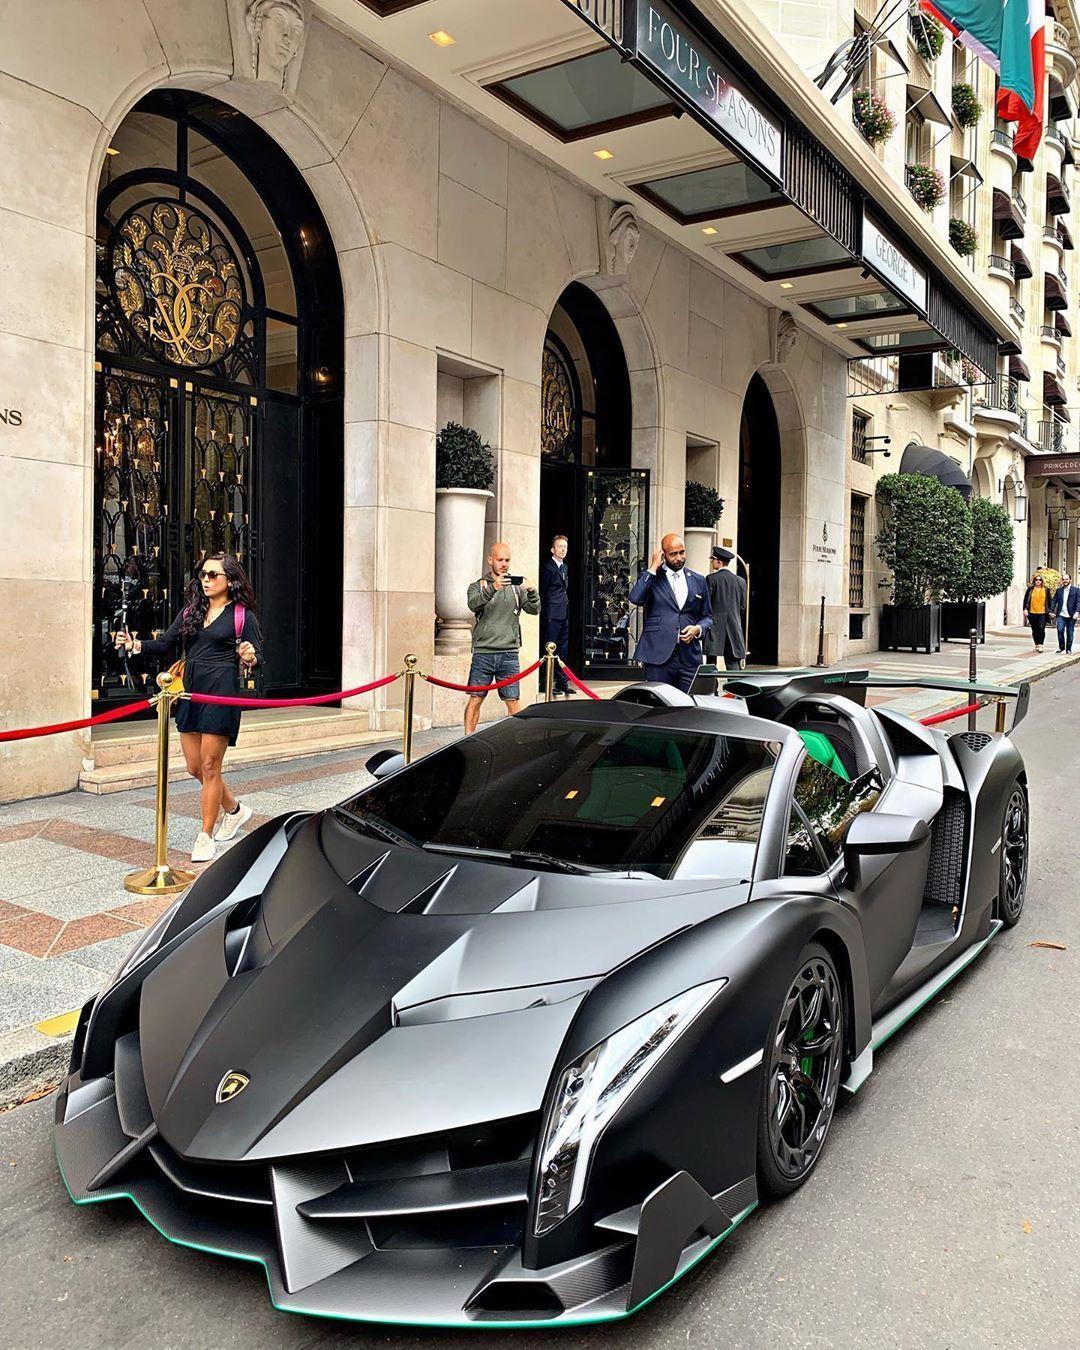 Lamborghini Veneno In 2020 Lamborghini Veneno Sports Cars Lamborghini